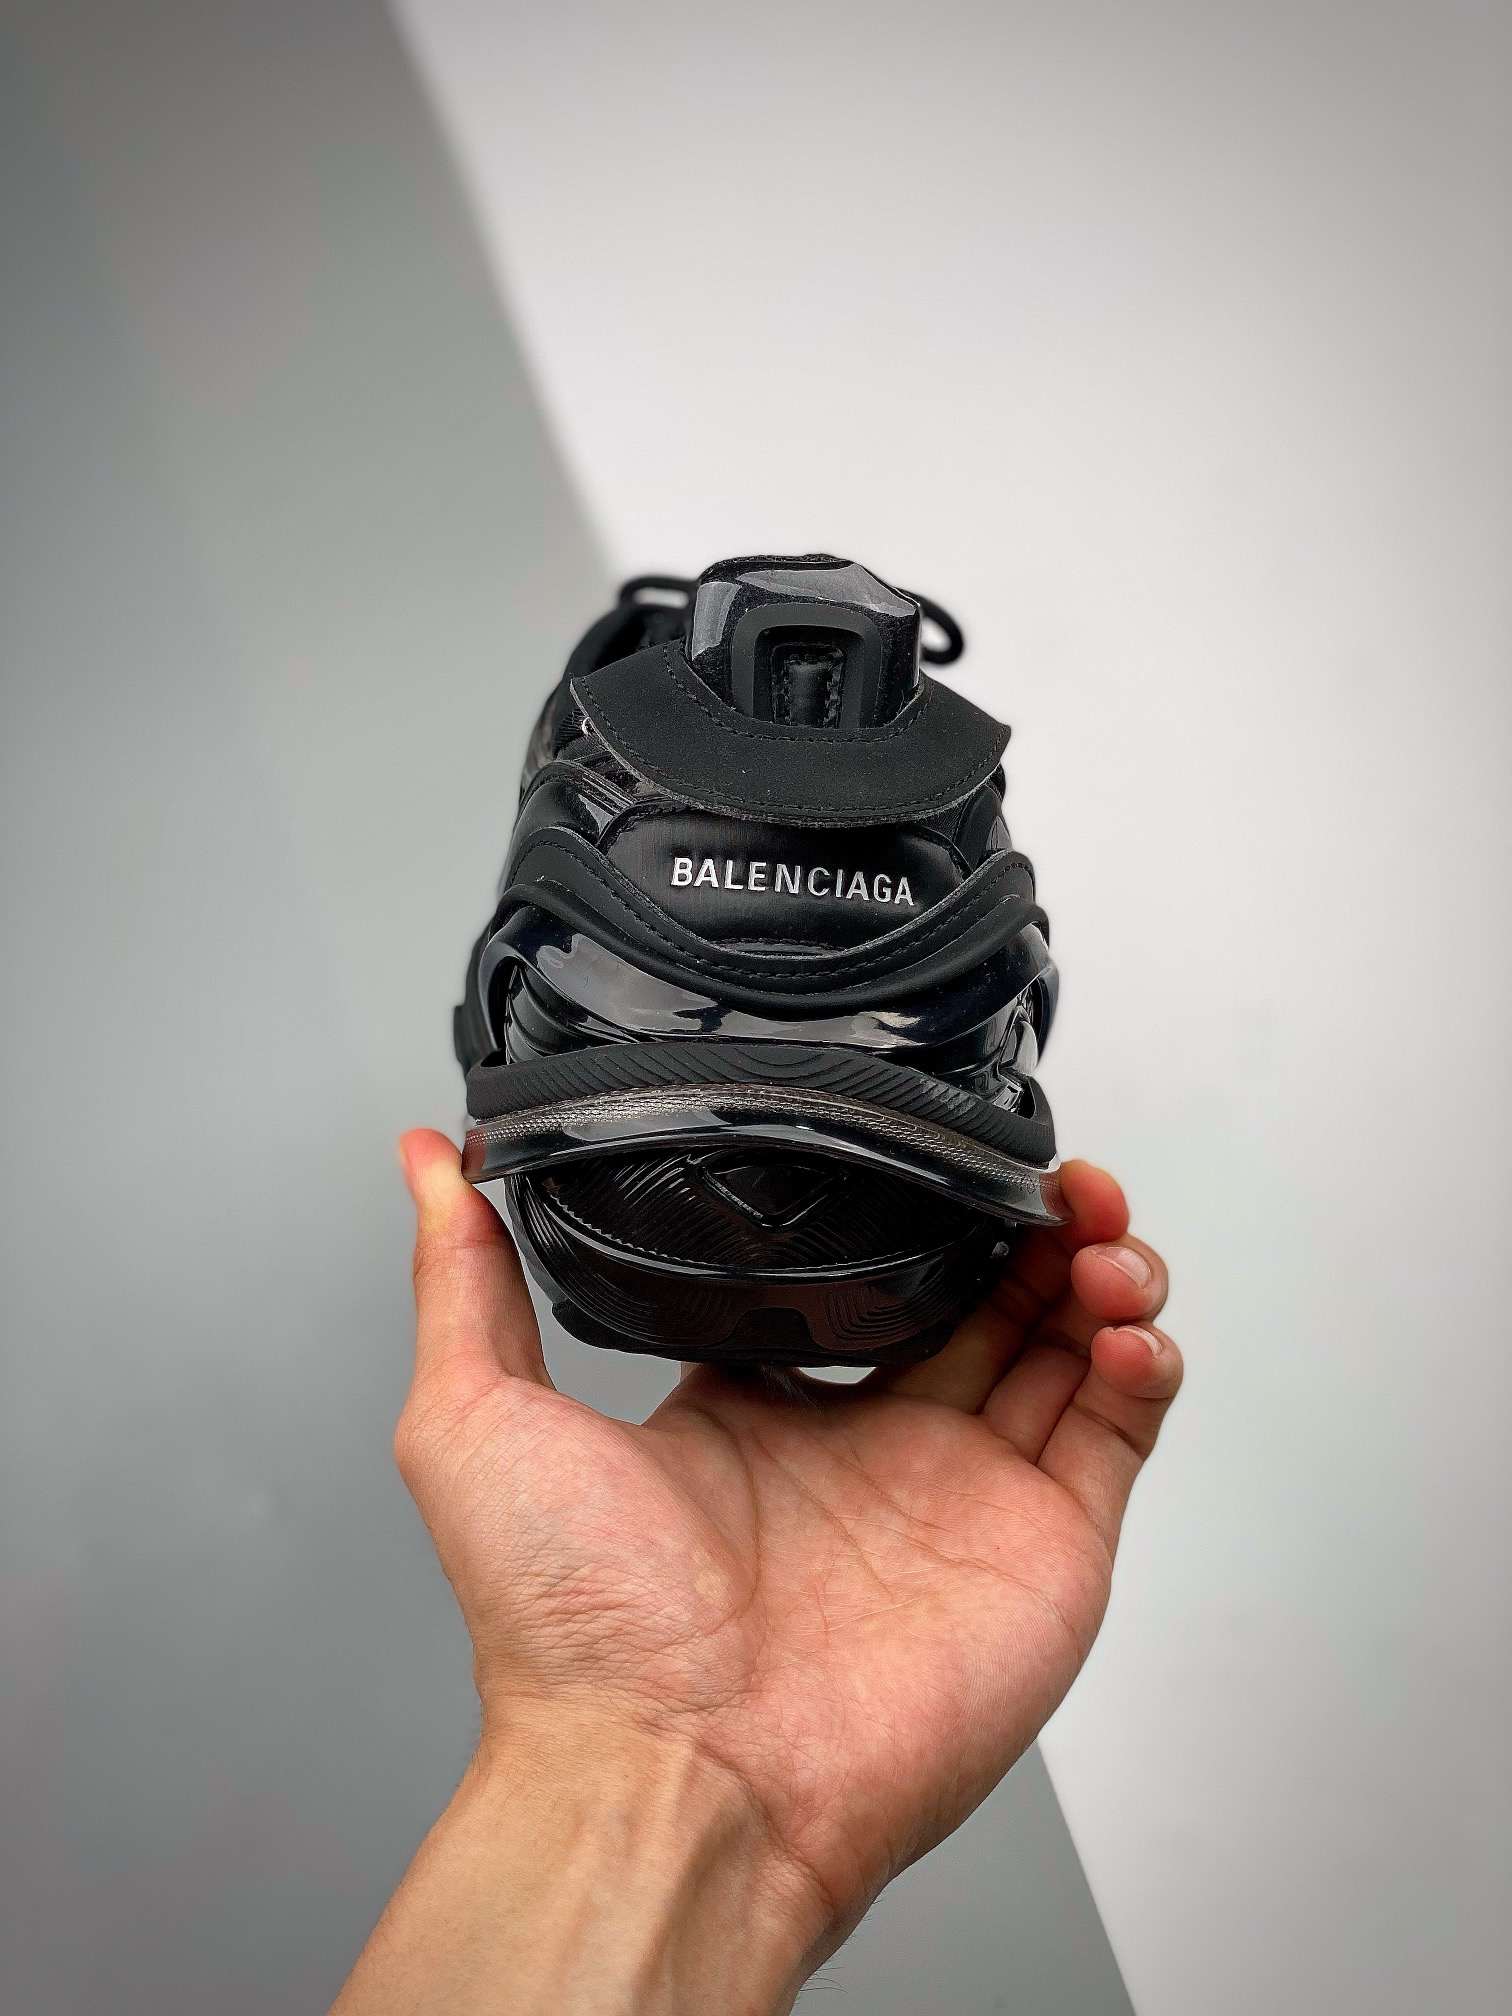 Balenciaga Runway Tyrex  Panelled Trainers巴黎世家20ss_河源的裸鞋都水分吗